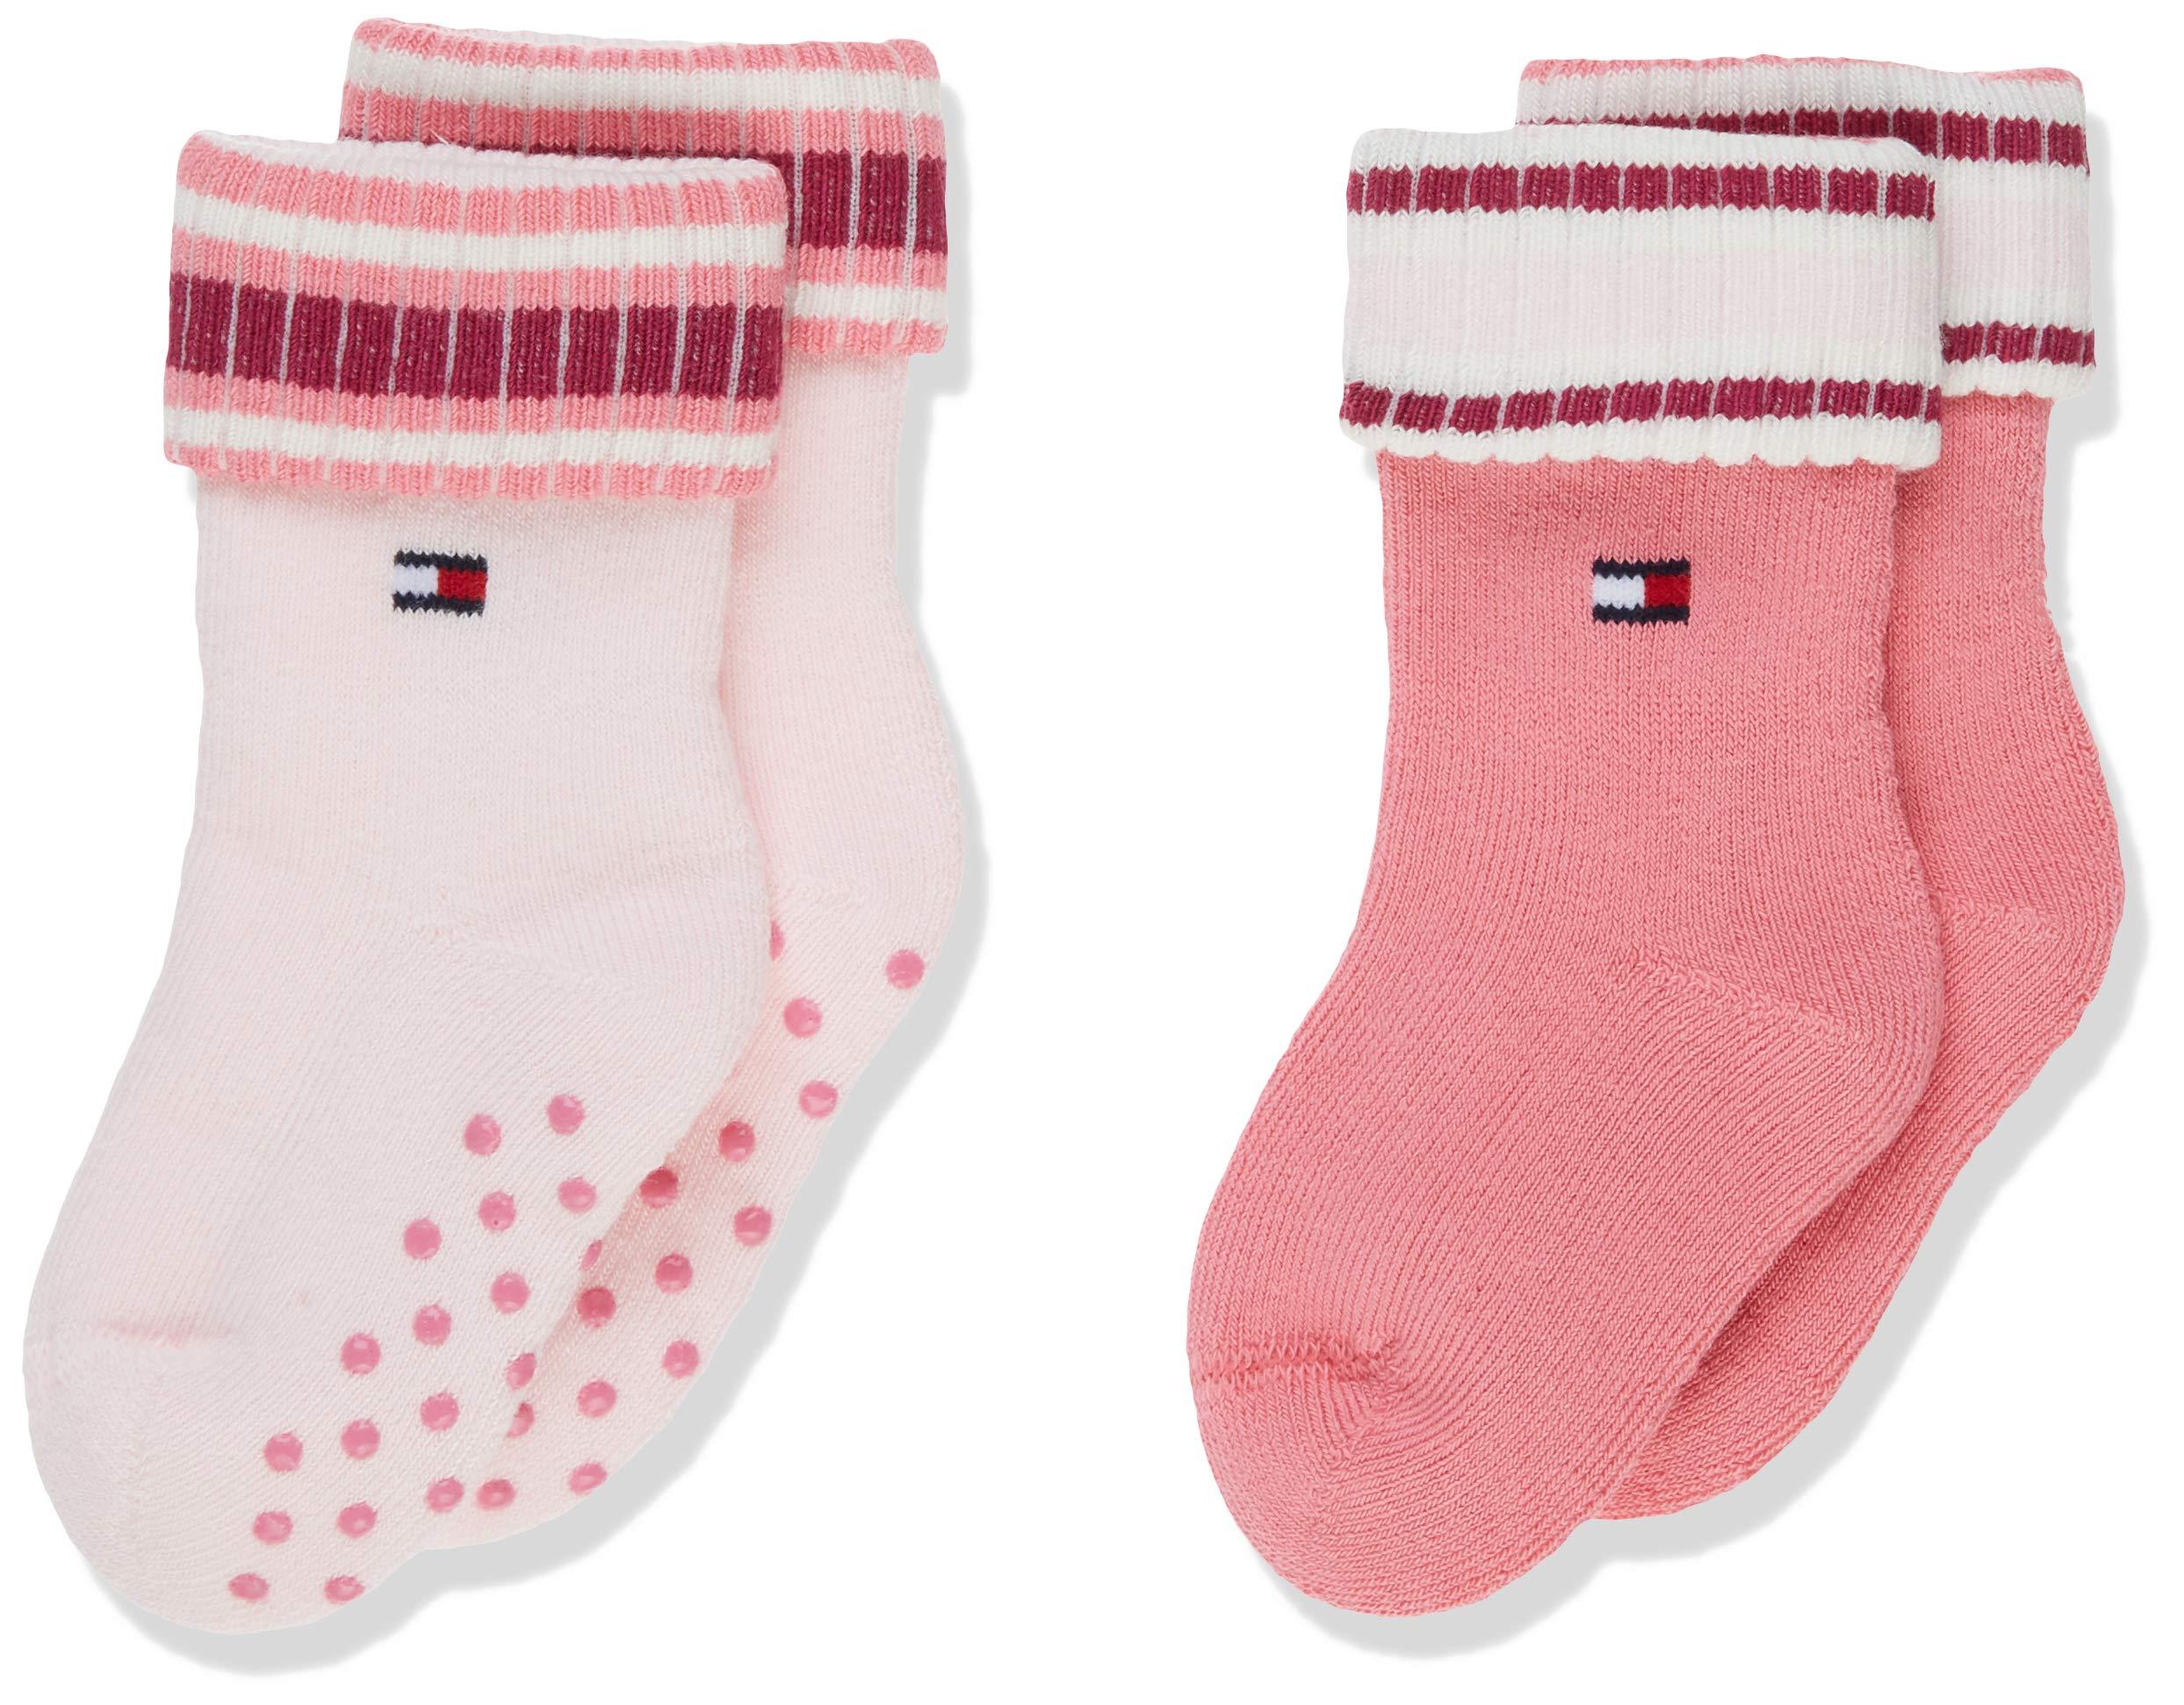 Tommy Hilfiger Calcetines (Pack de 2) para Bebés 5